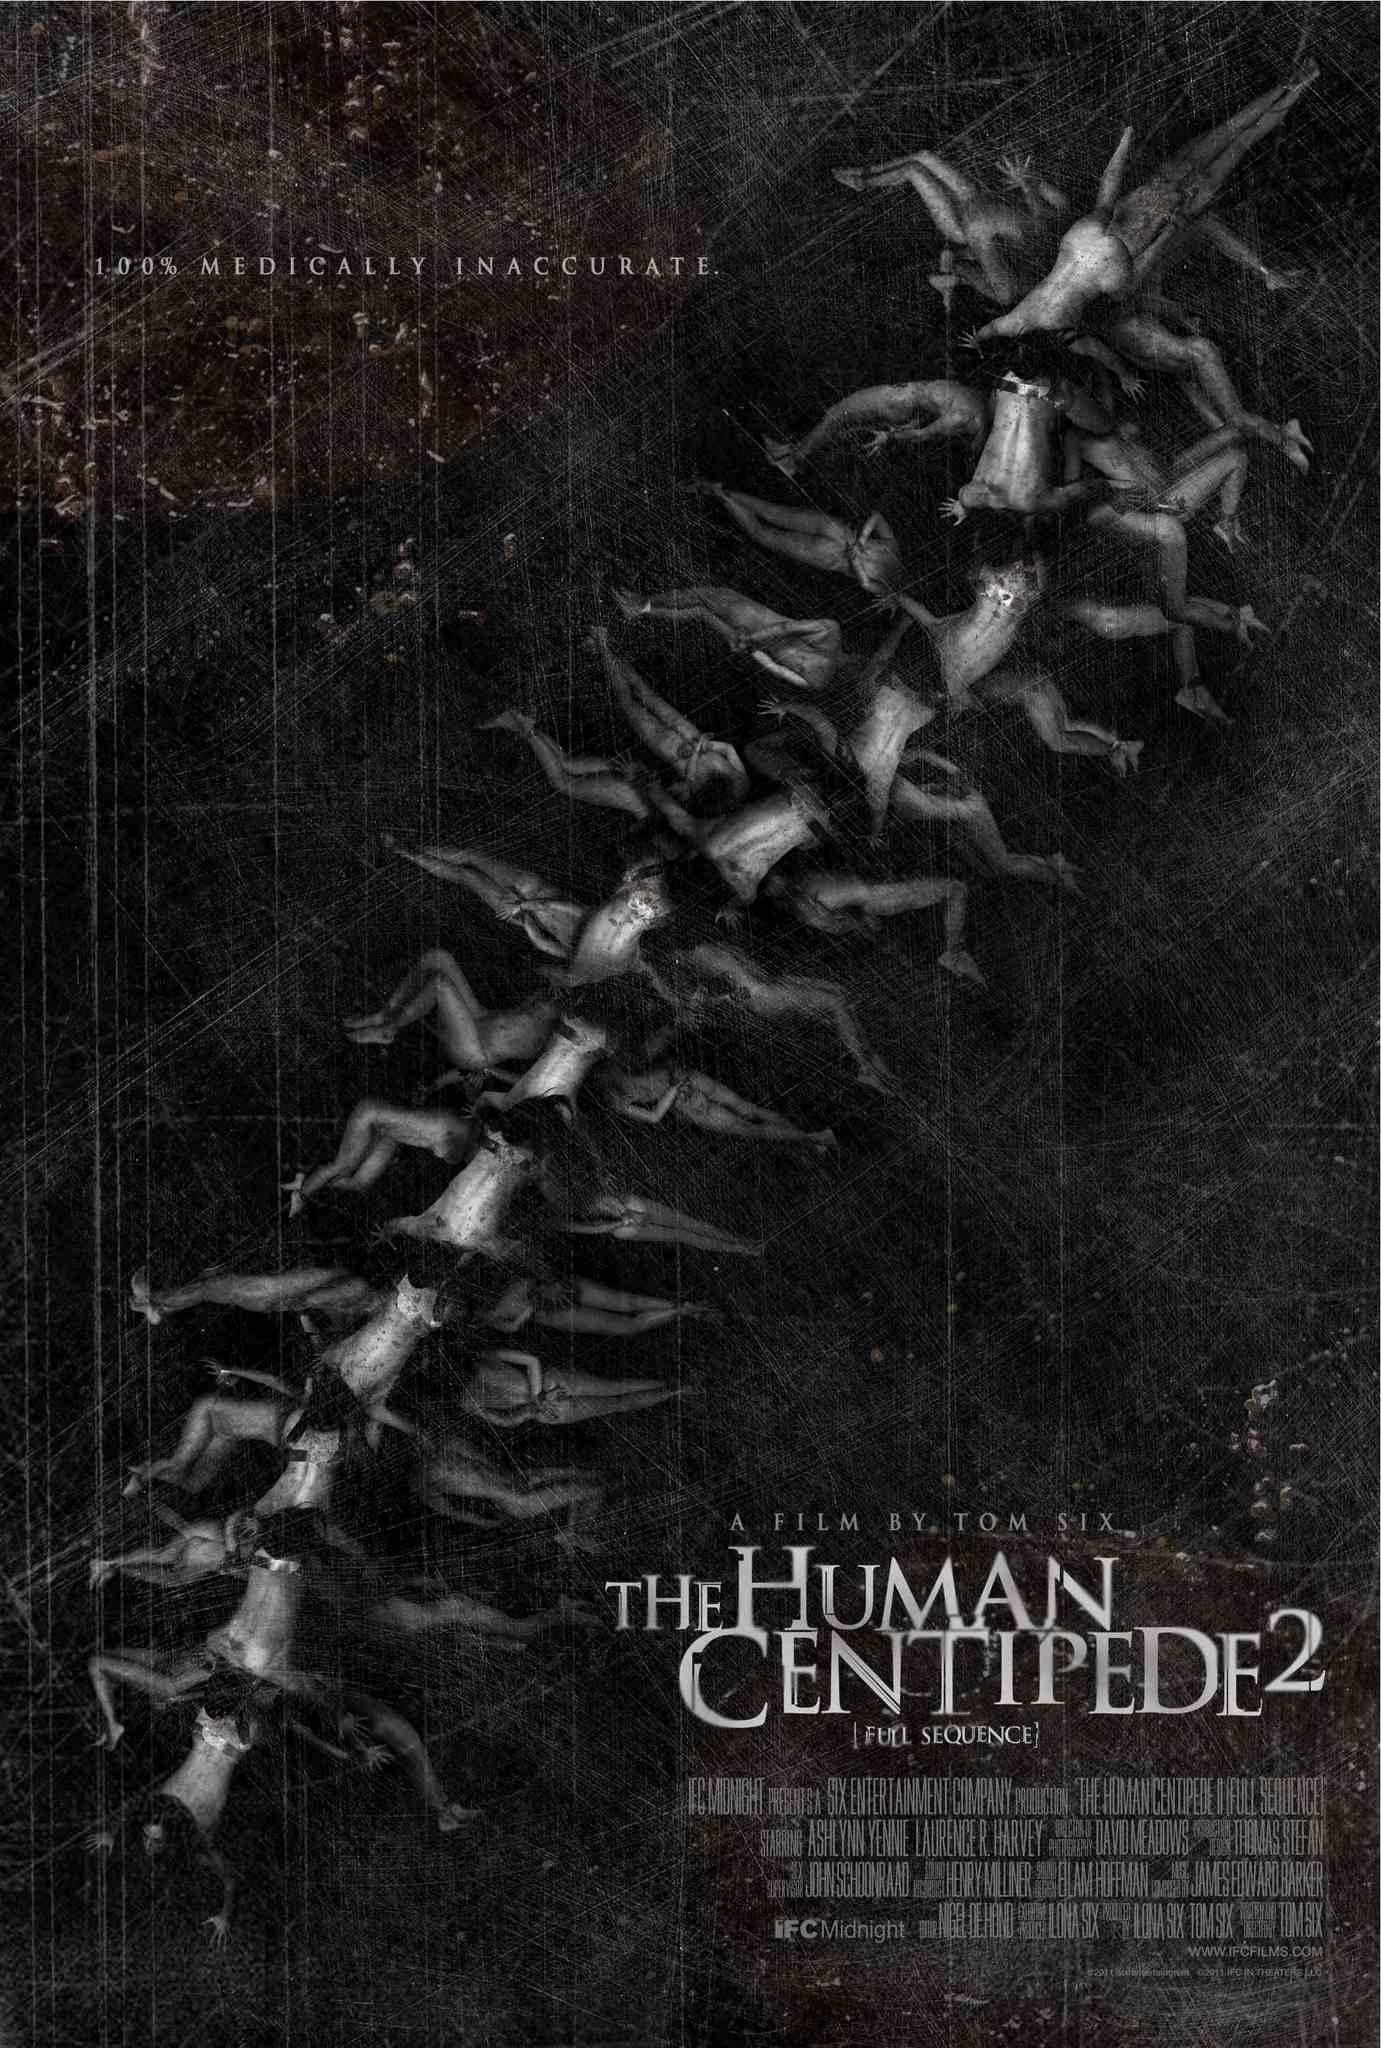 فيلم 2011 2 The Human Centipede مترجم للكبار فقط